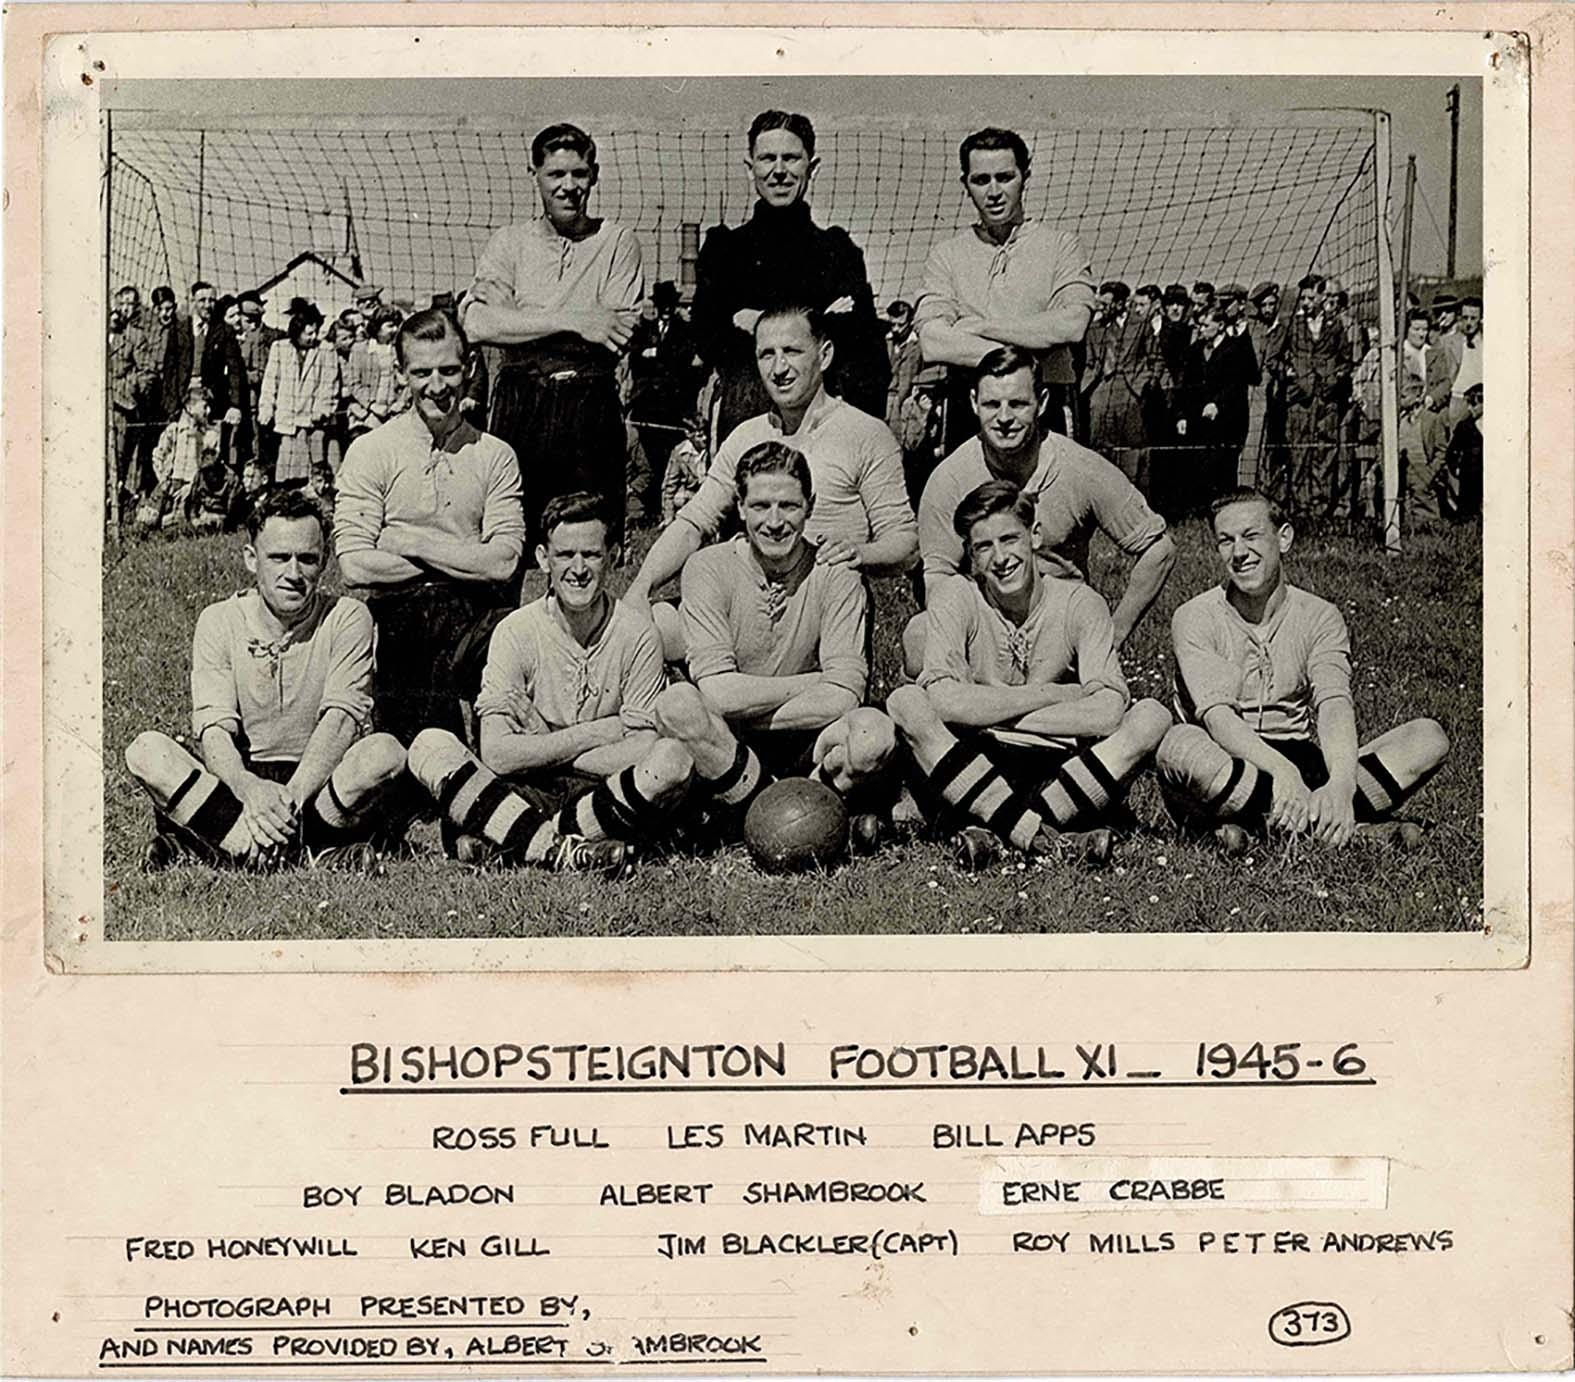 Mounted Photograph of Bishopsteignton Football XI 1945-6.